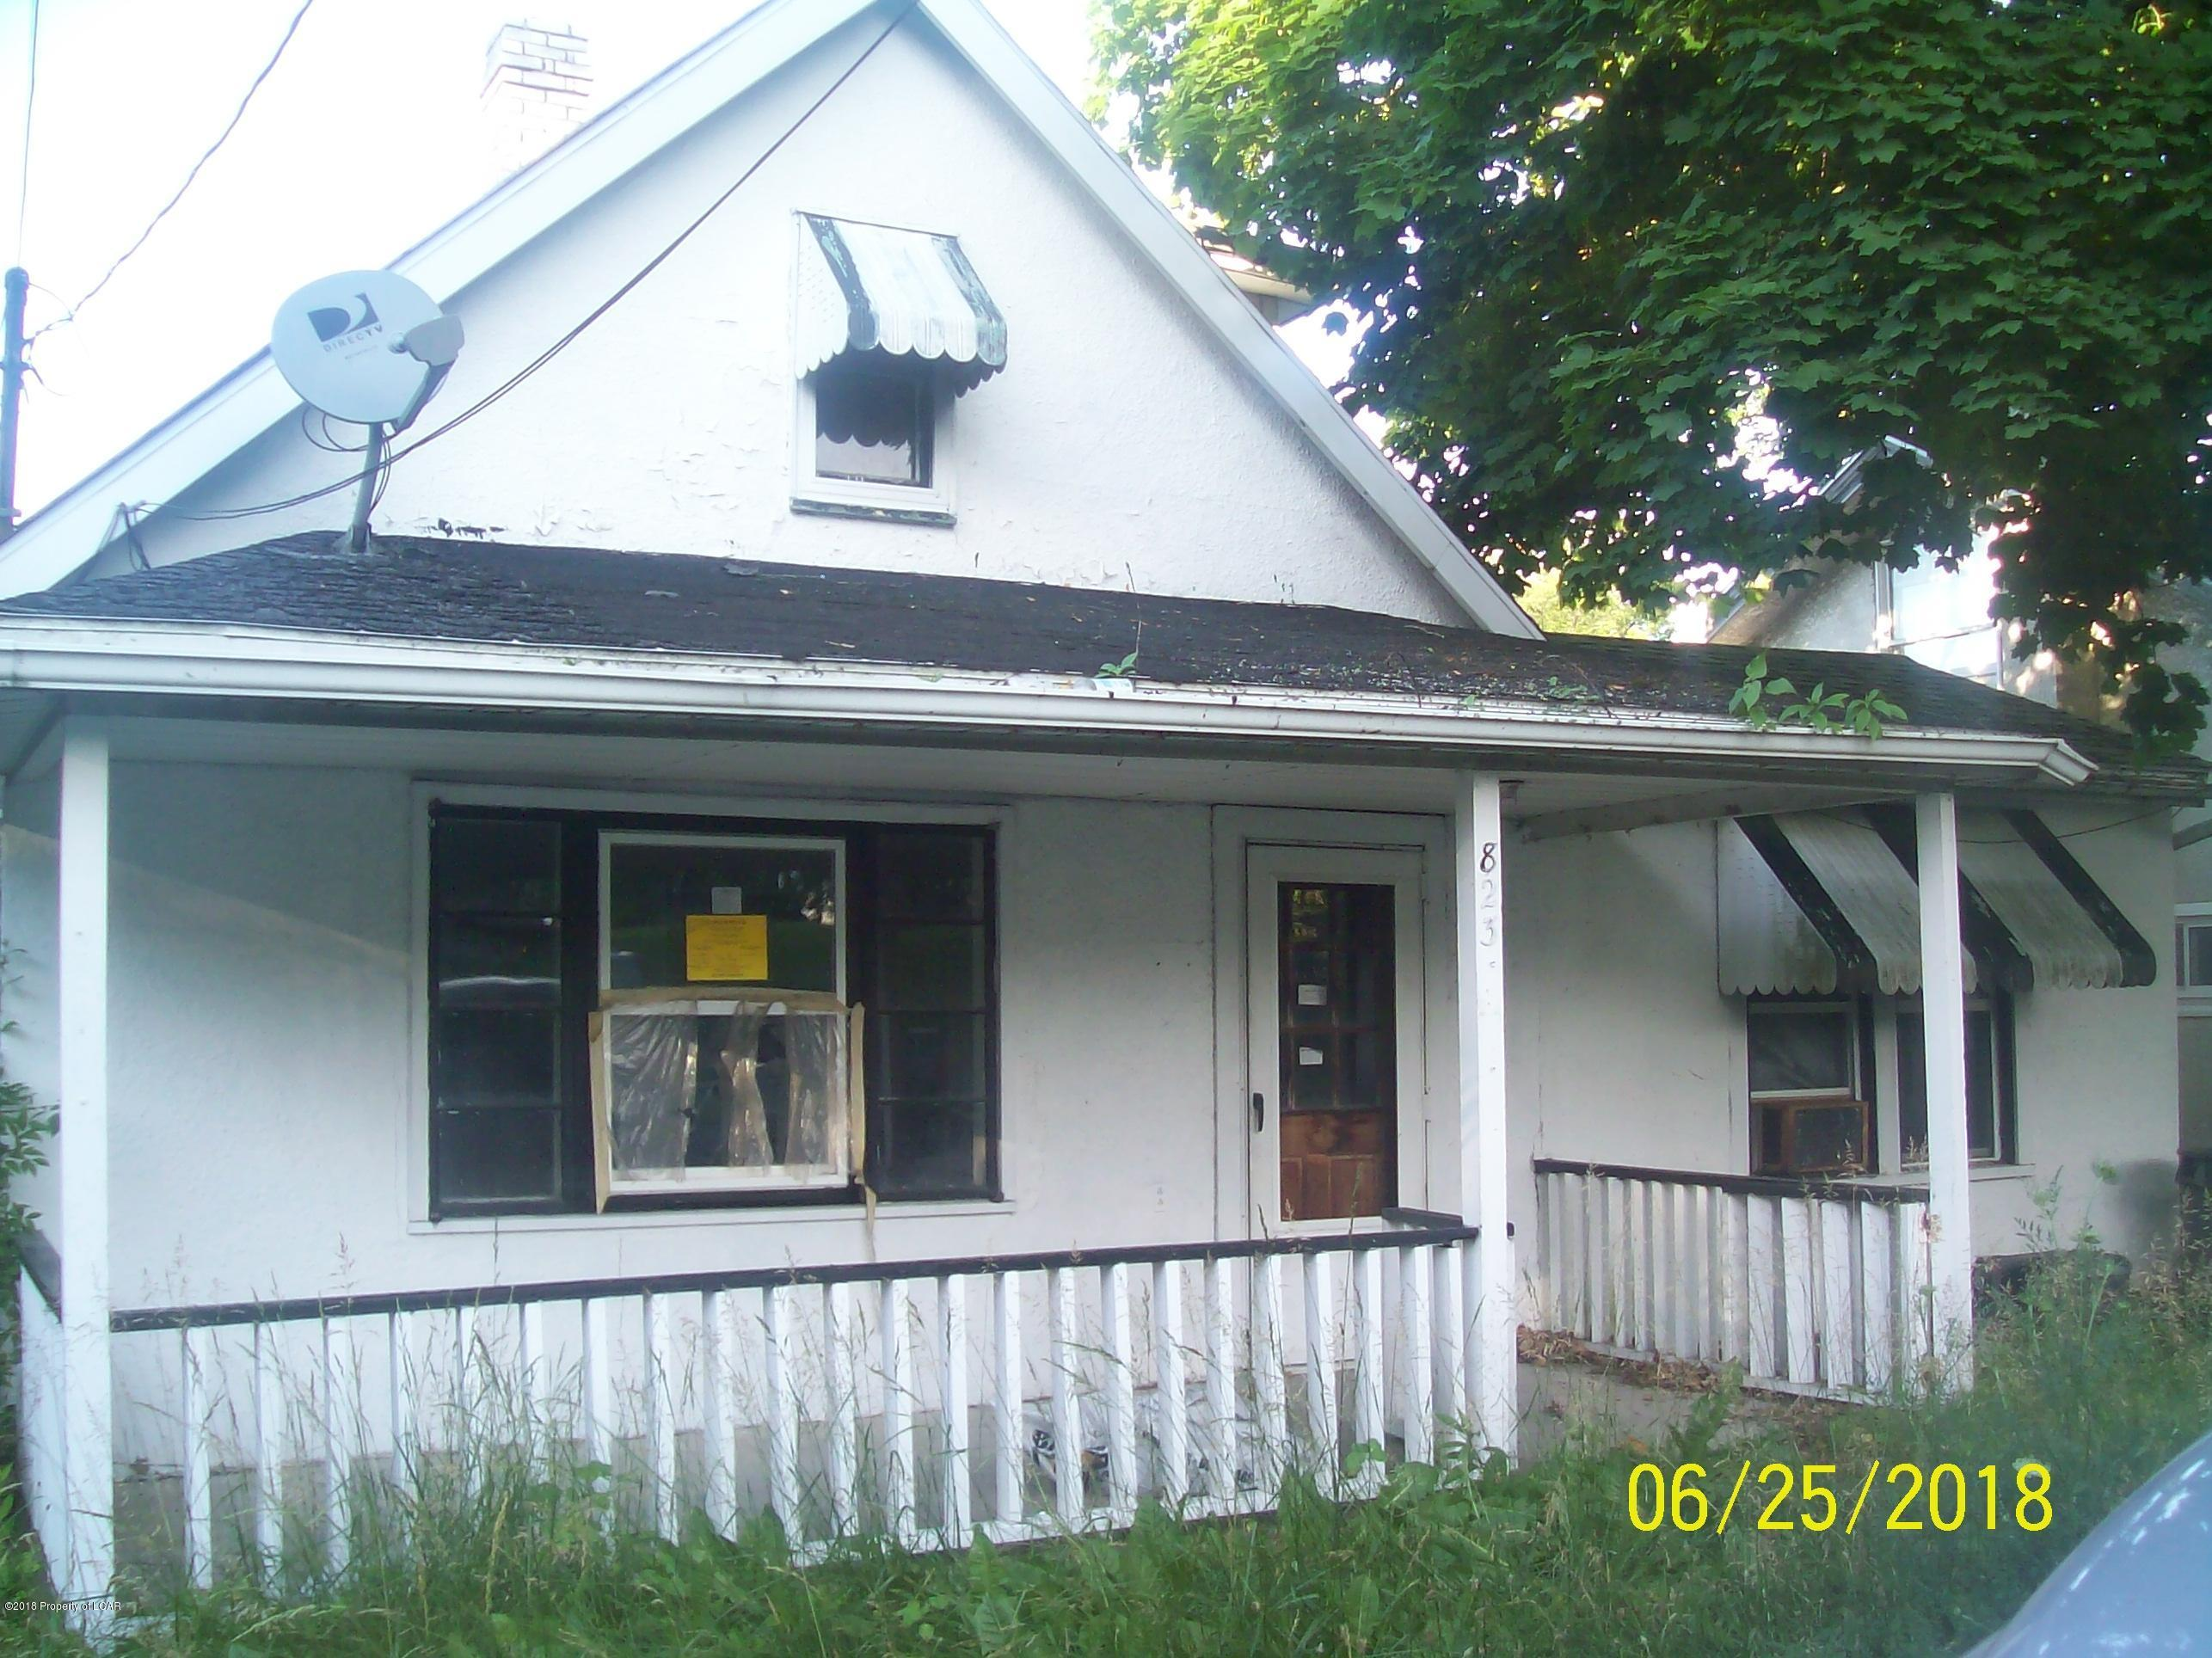 823 Raines St, Scranton, PA 18509